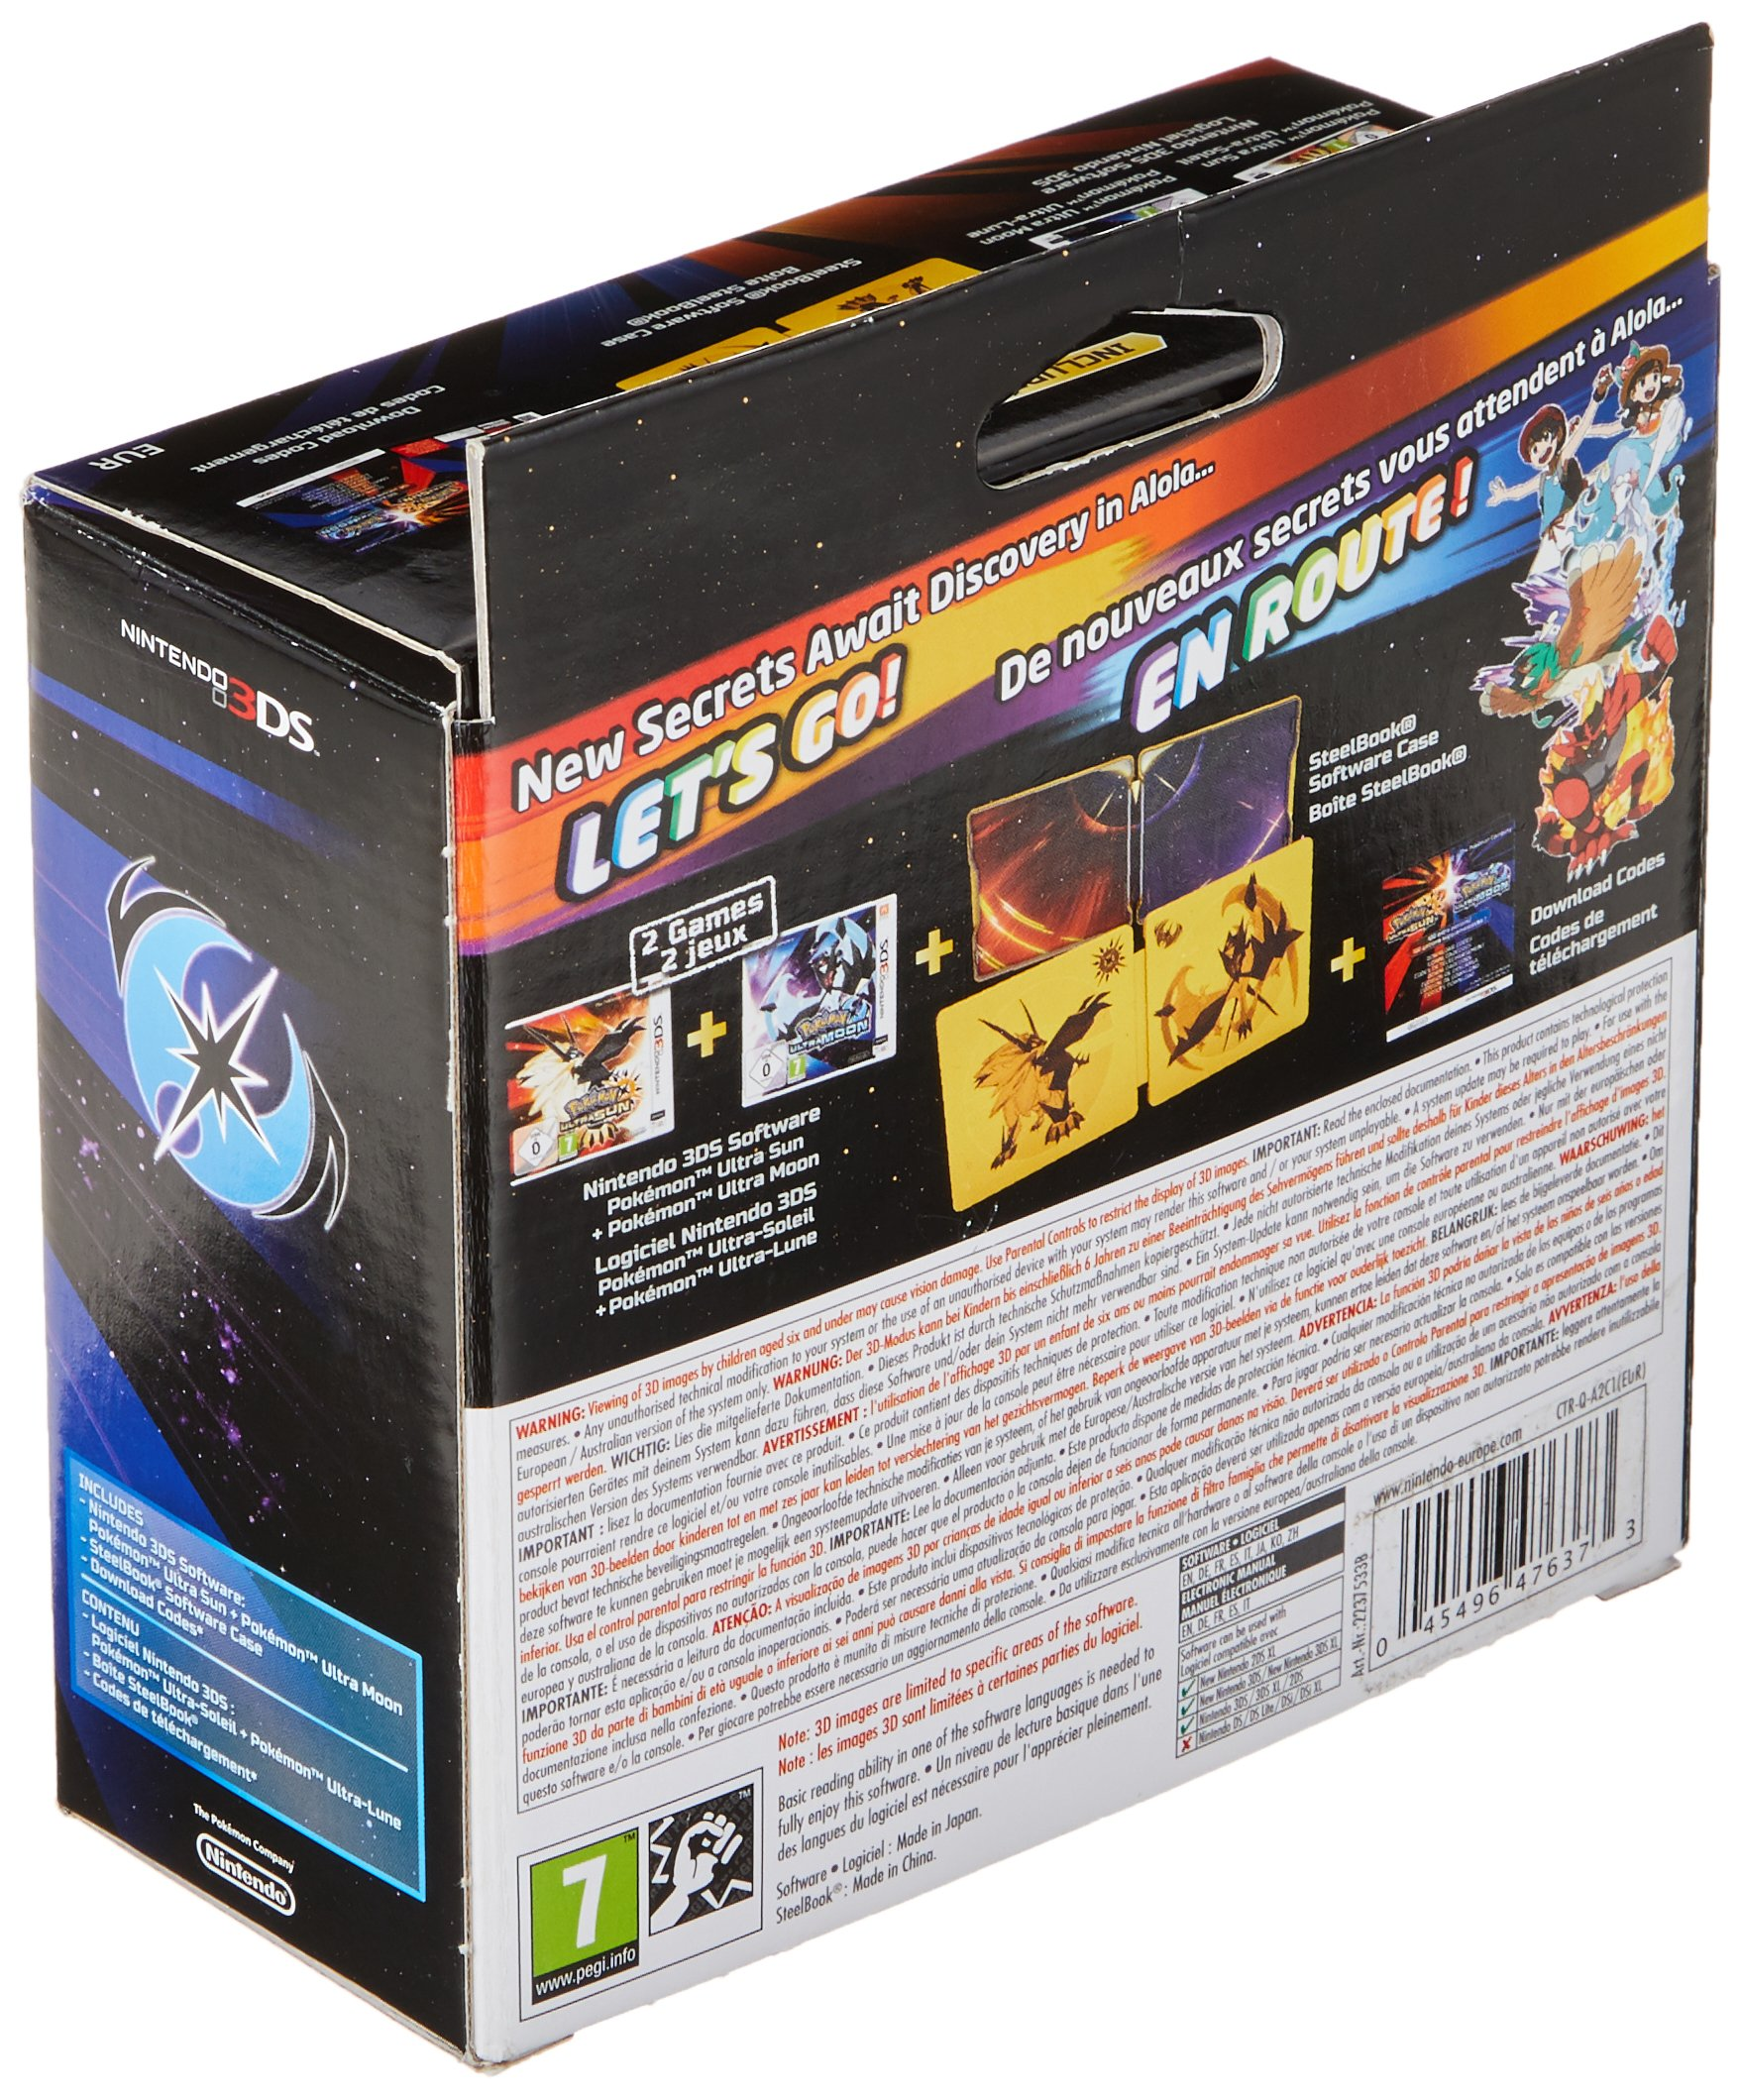 Pokémon Ultra Sole E Luna Collector: Amazon.es: Videojuegos